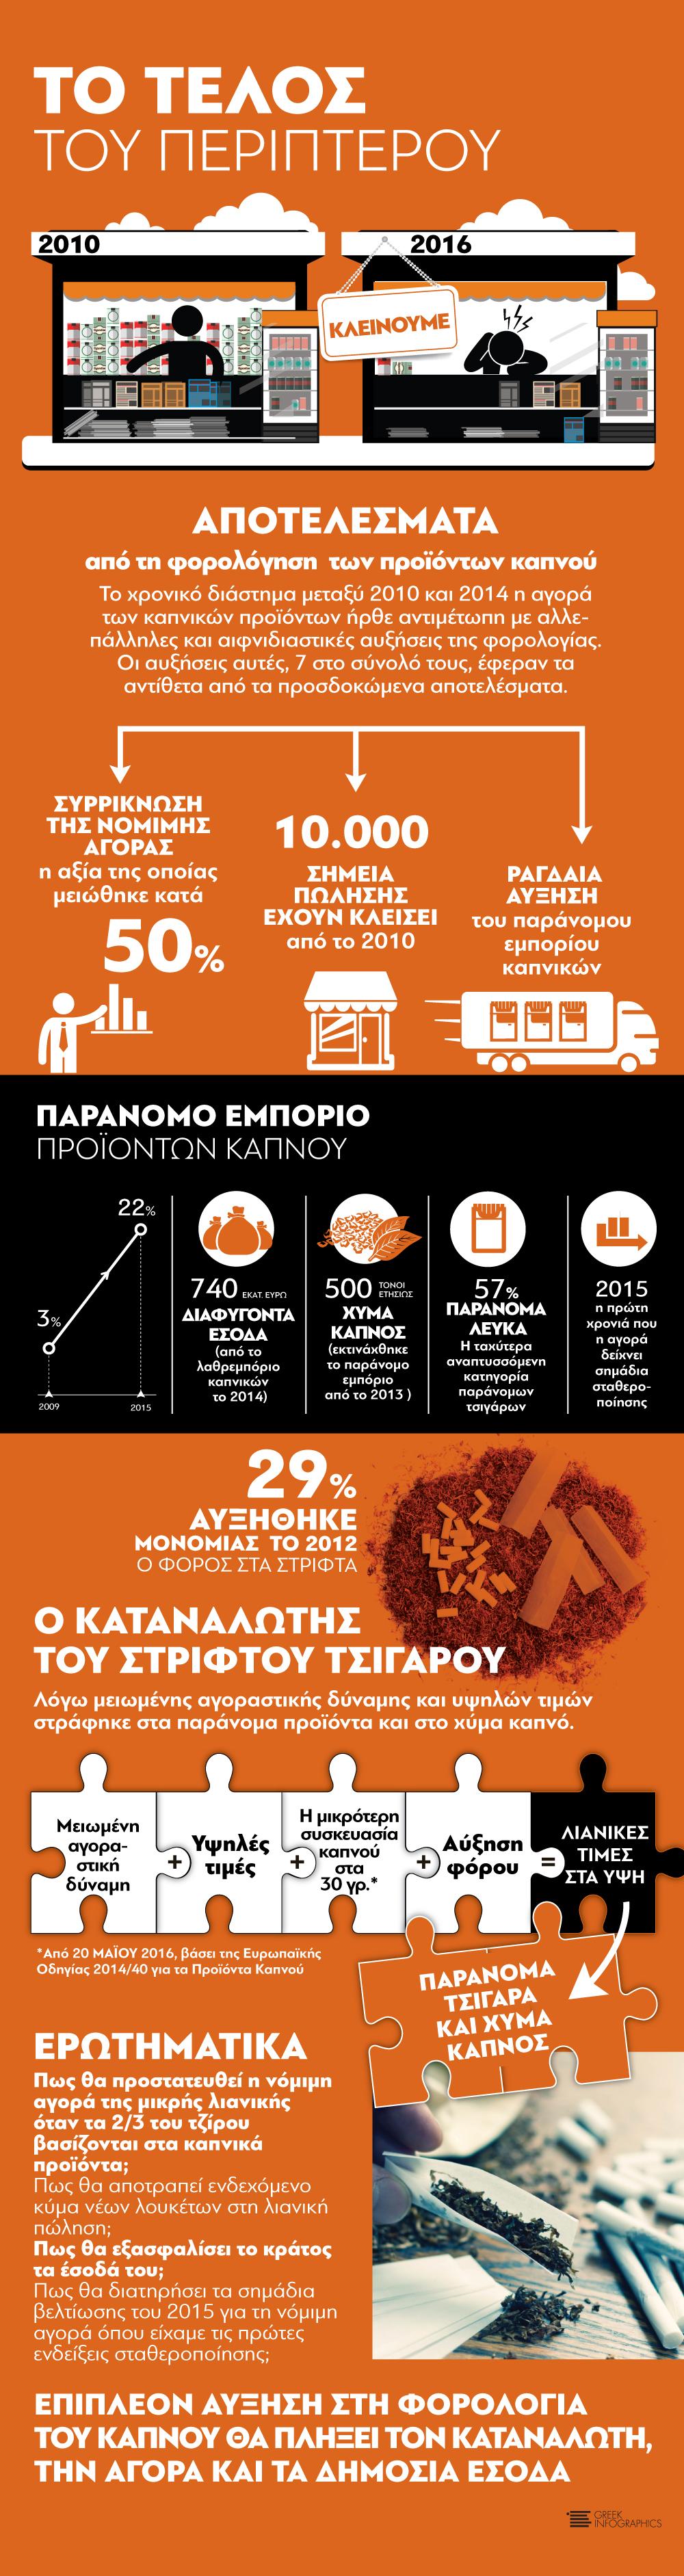 infographic periptero